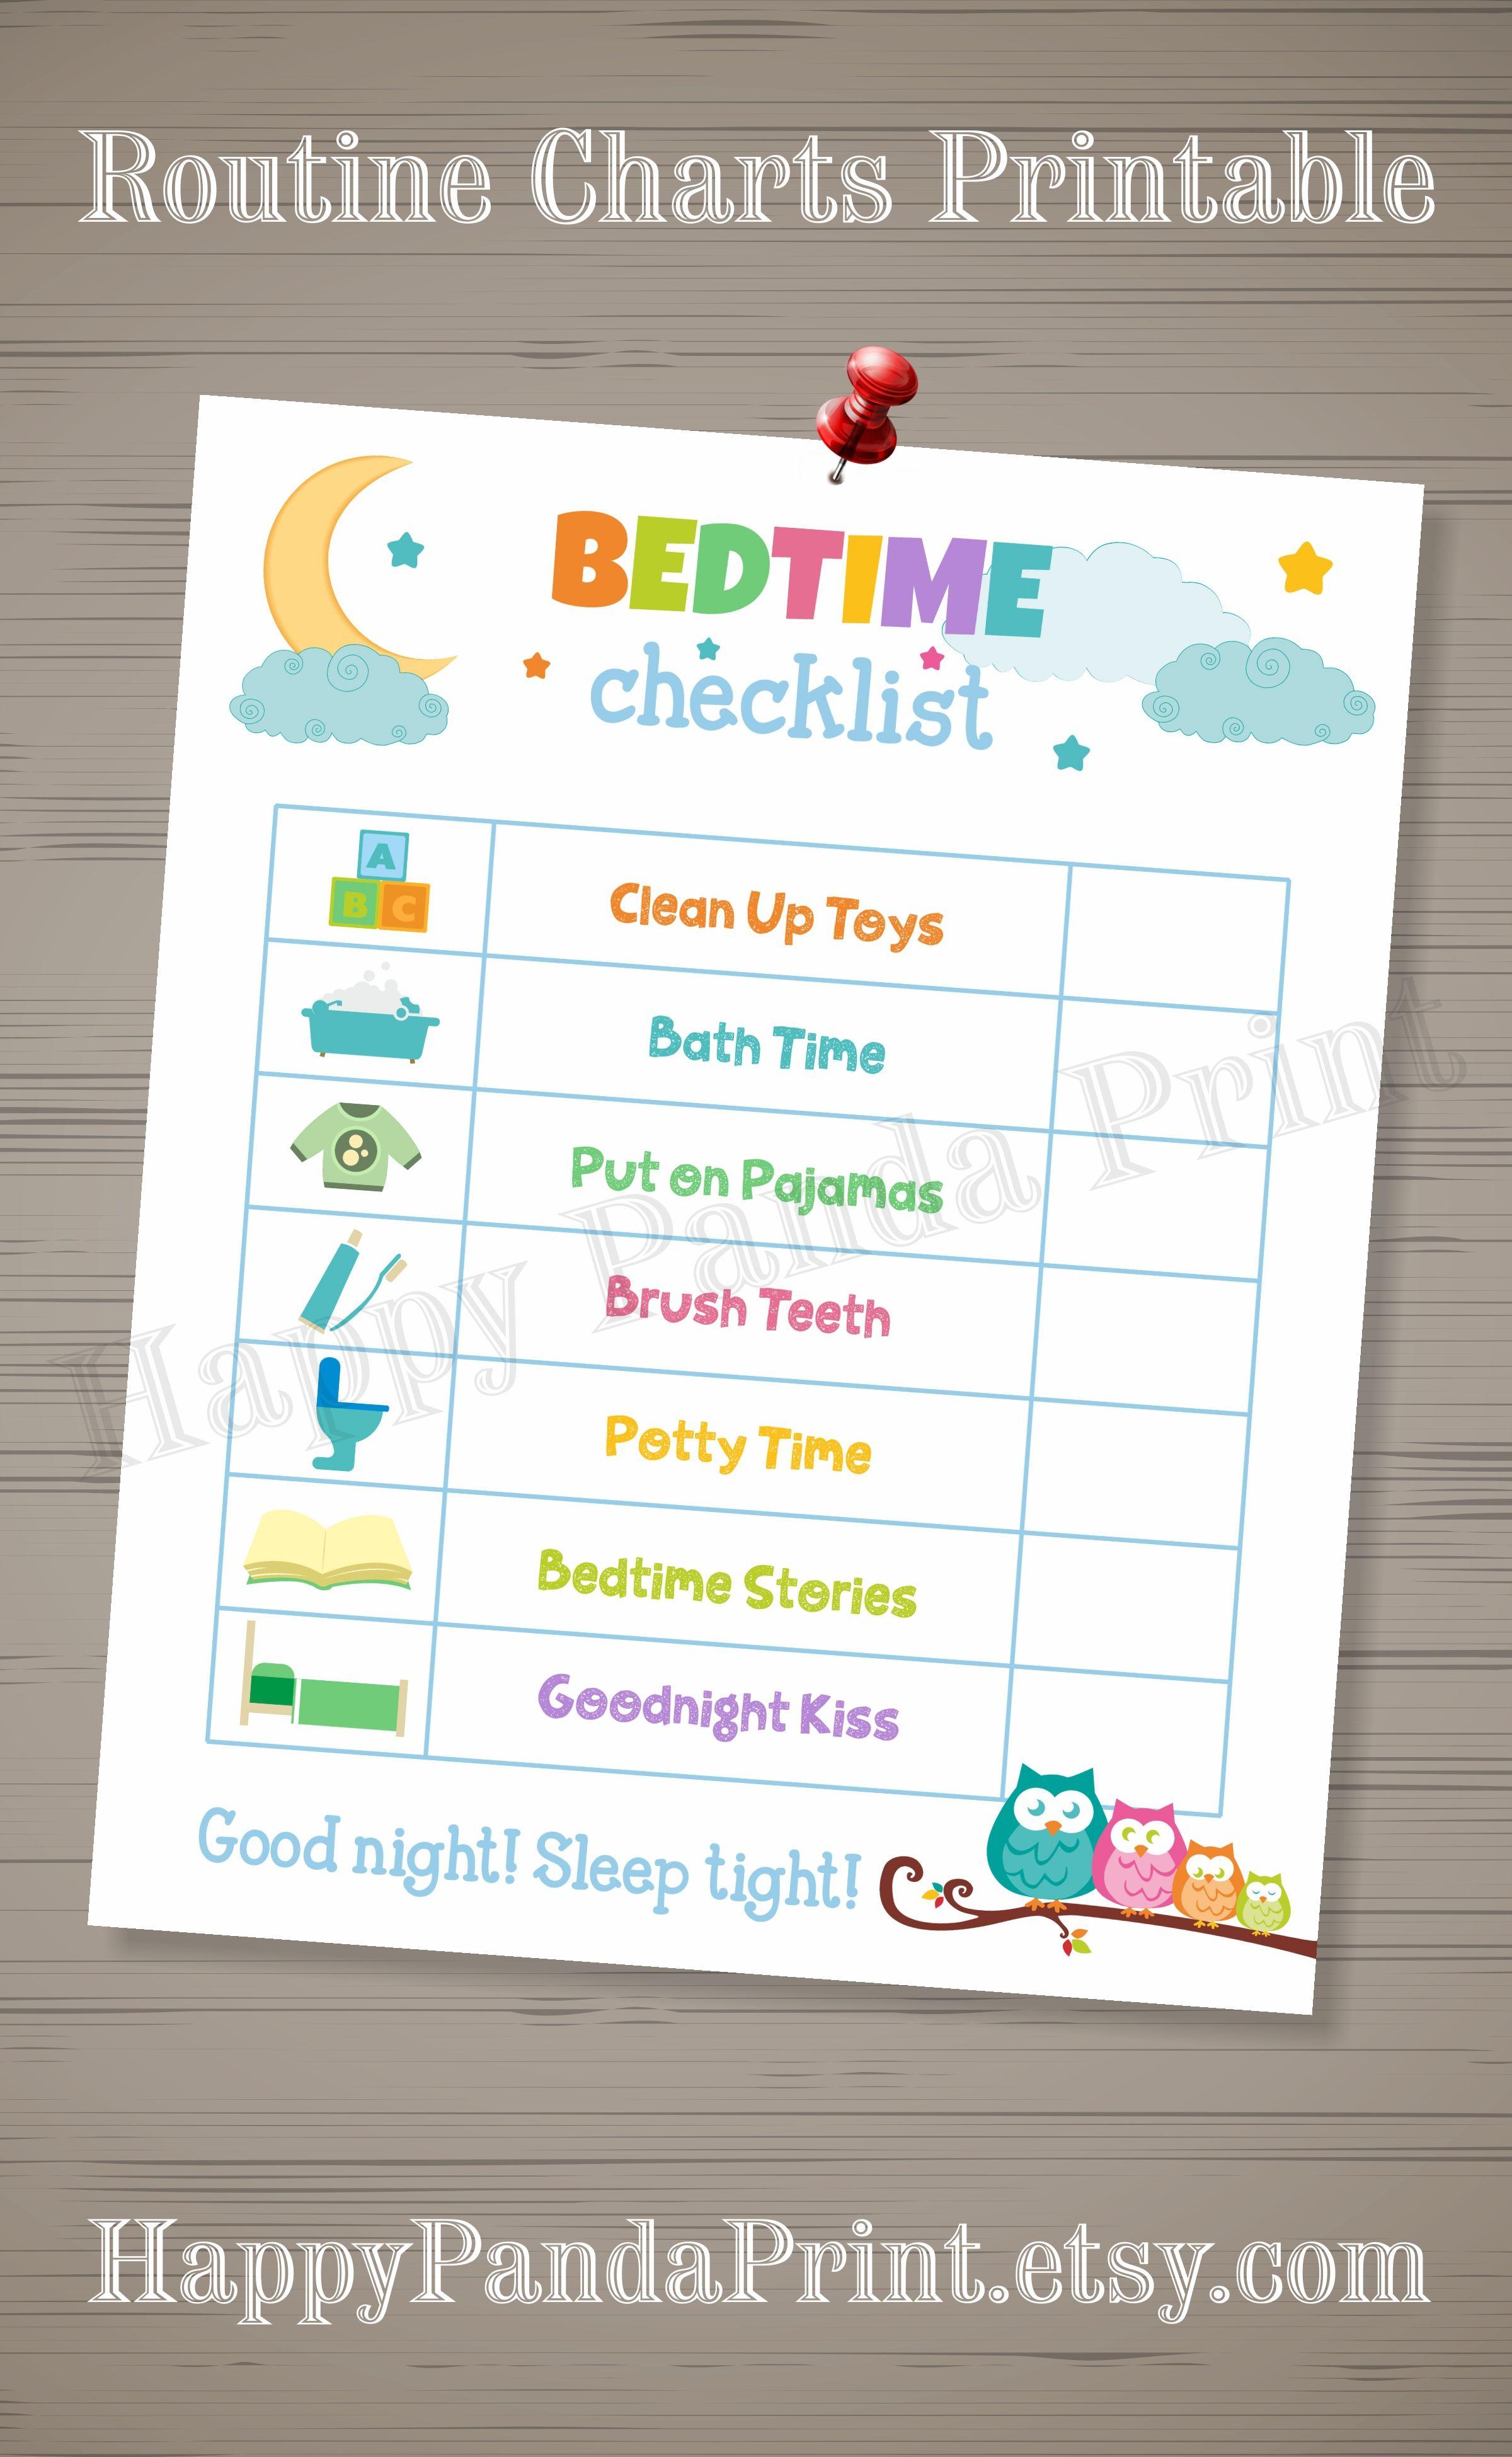 Daily Bedtime Checklist Printable Bedtime Routine Checklist Bedtime Charts Kids Charts To Do